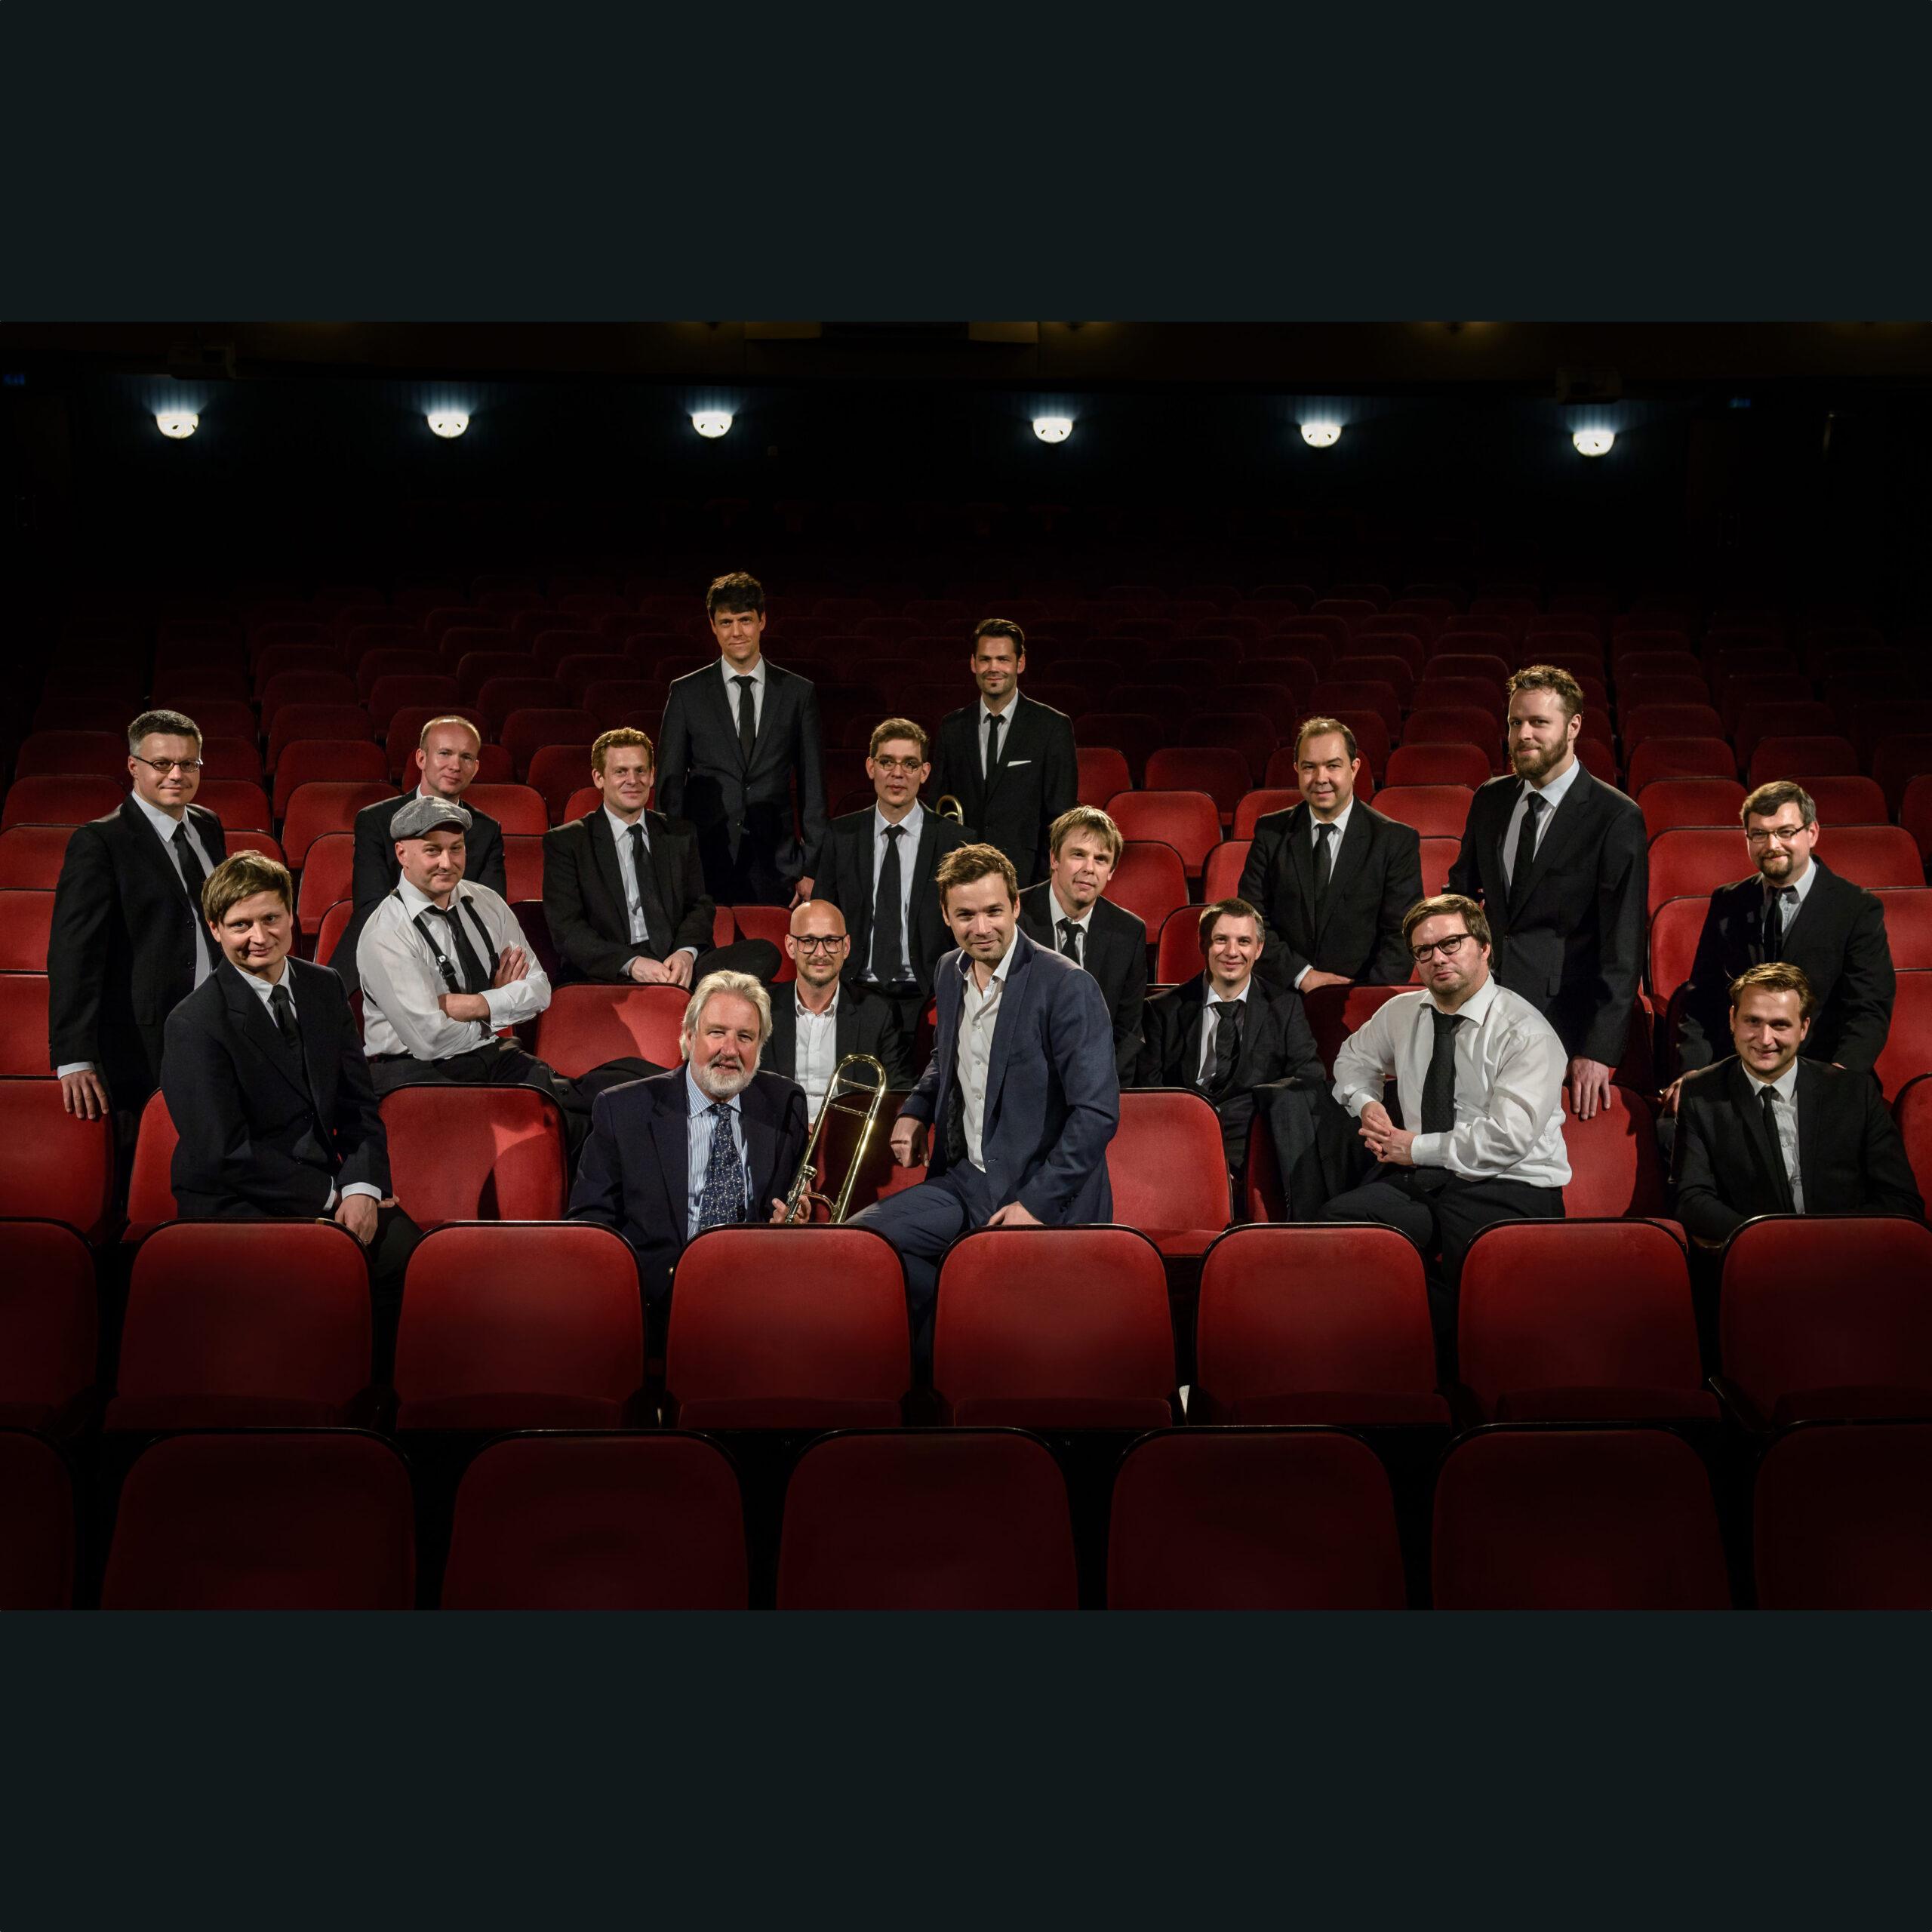 Berlin Jazz Orchestra - german jazz big band - GAM Music